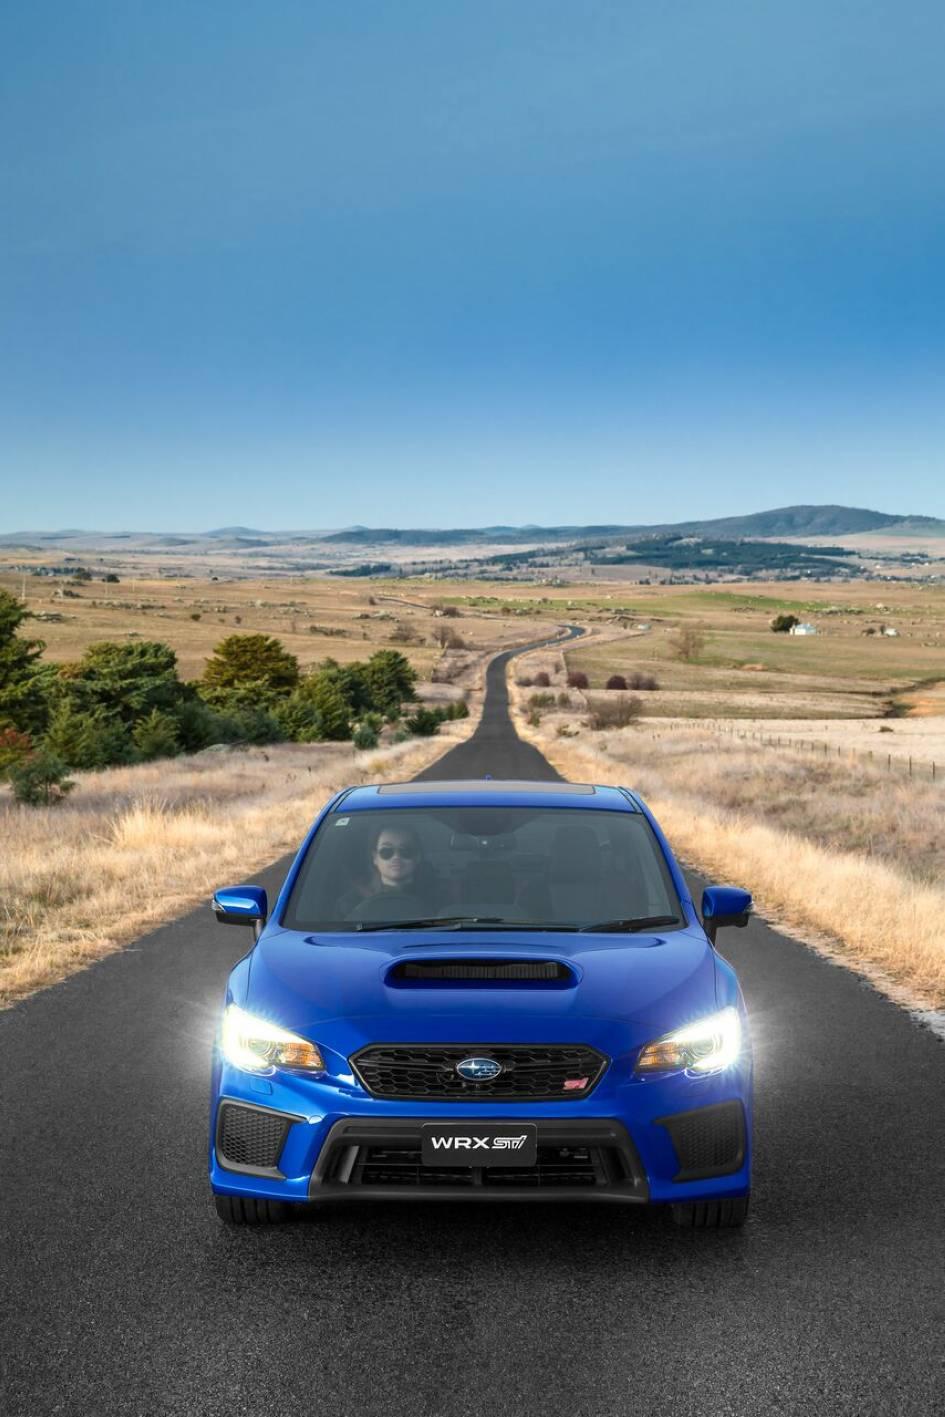 Brz Vs Wrx >> Updated 2018 Subaru WRX & WRX STI land, new spec.R tops range - ForceGT.com